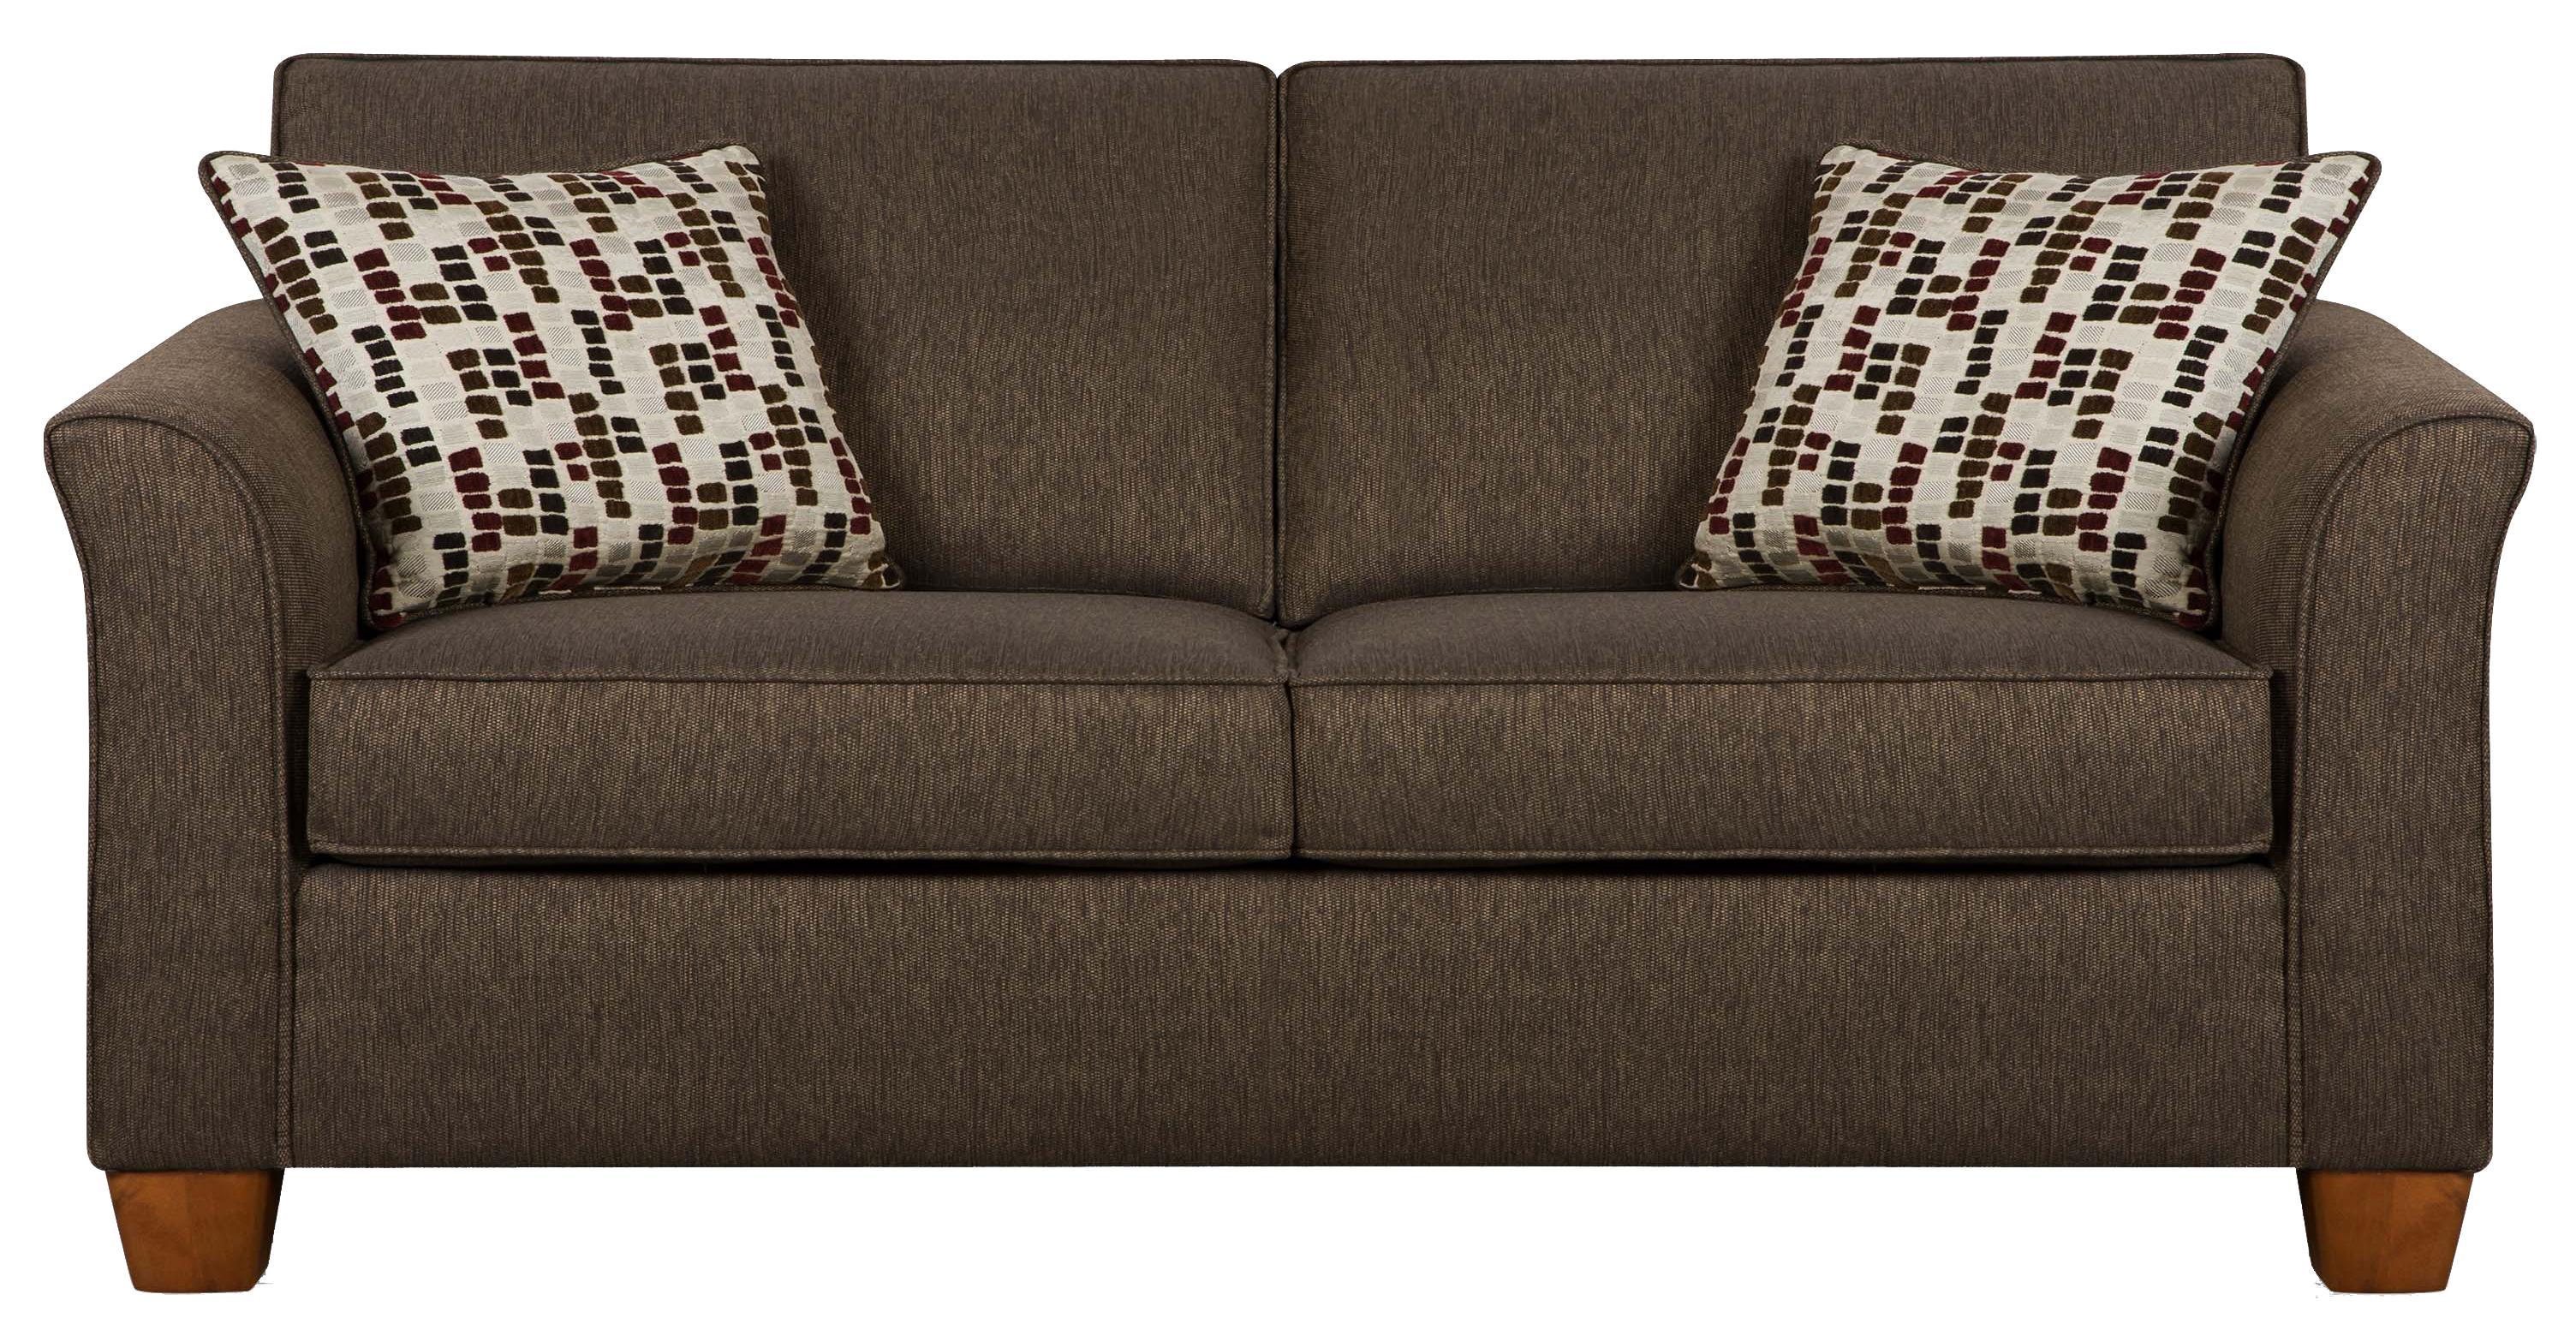 Simmons Upholstery 7251 7251 Full Size Sofa Sleeper In